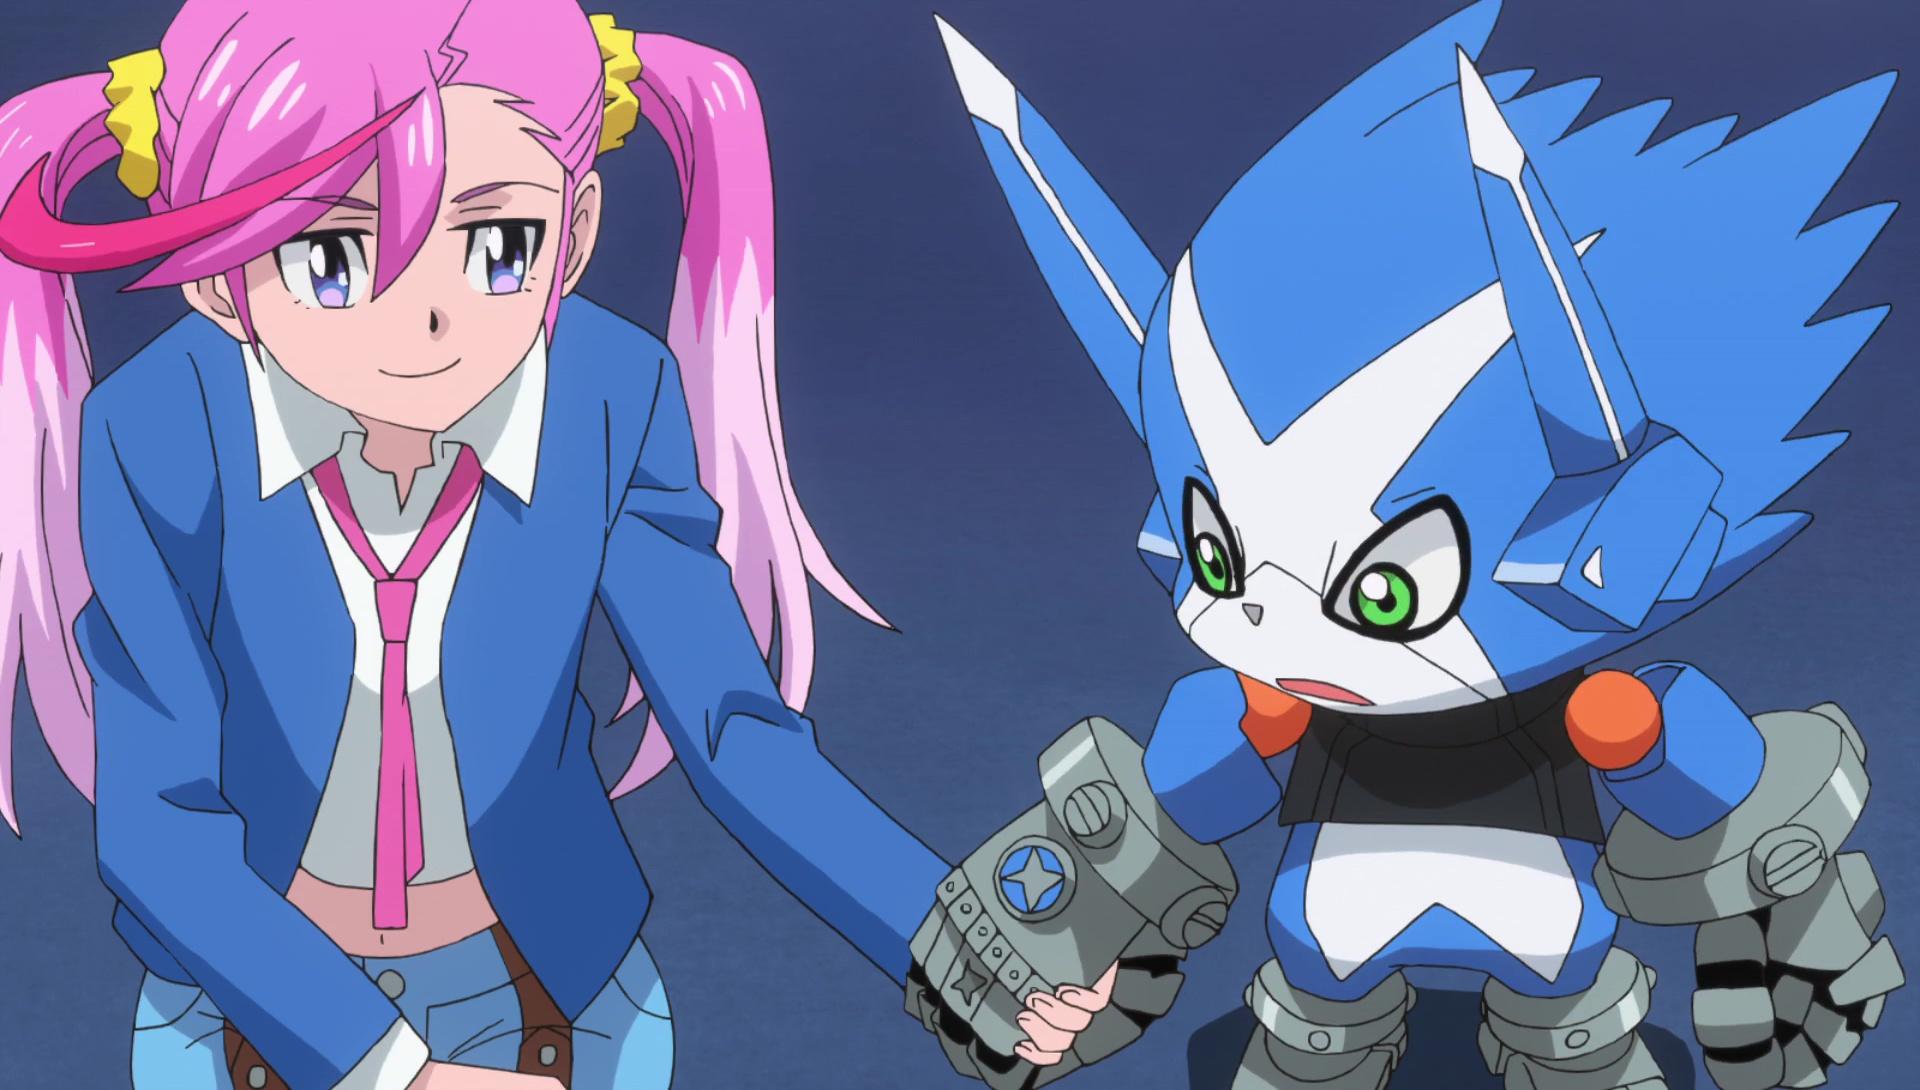 [VOSTA] Digimon Universe Appli Monsters : Episode 05 + EP04 VOSTFR